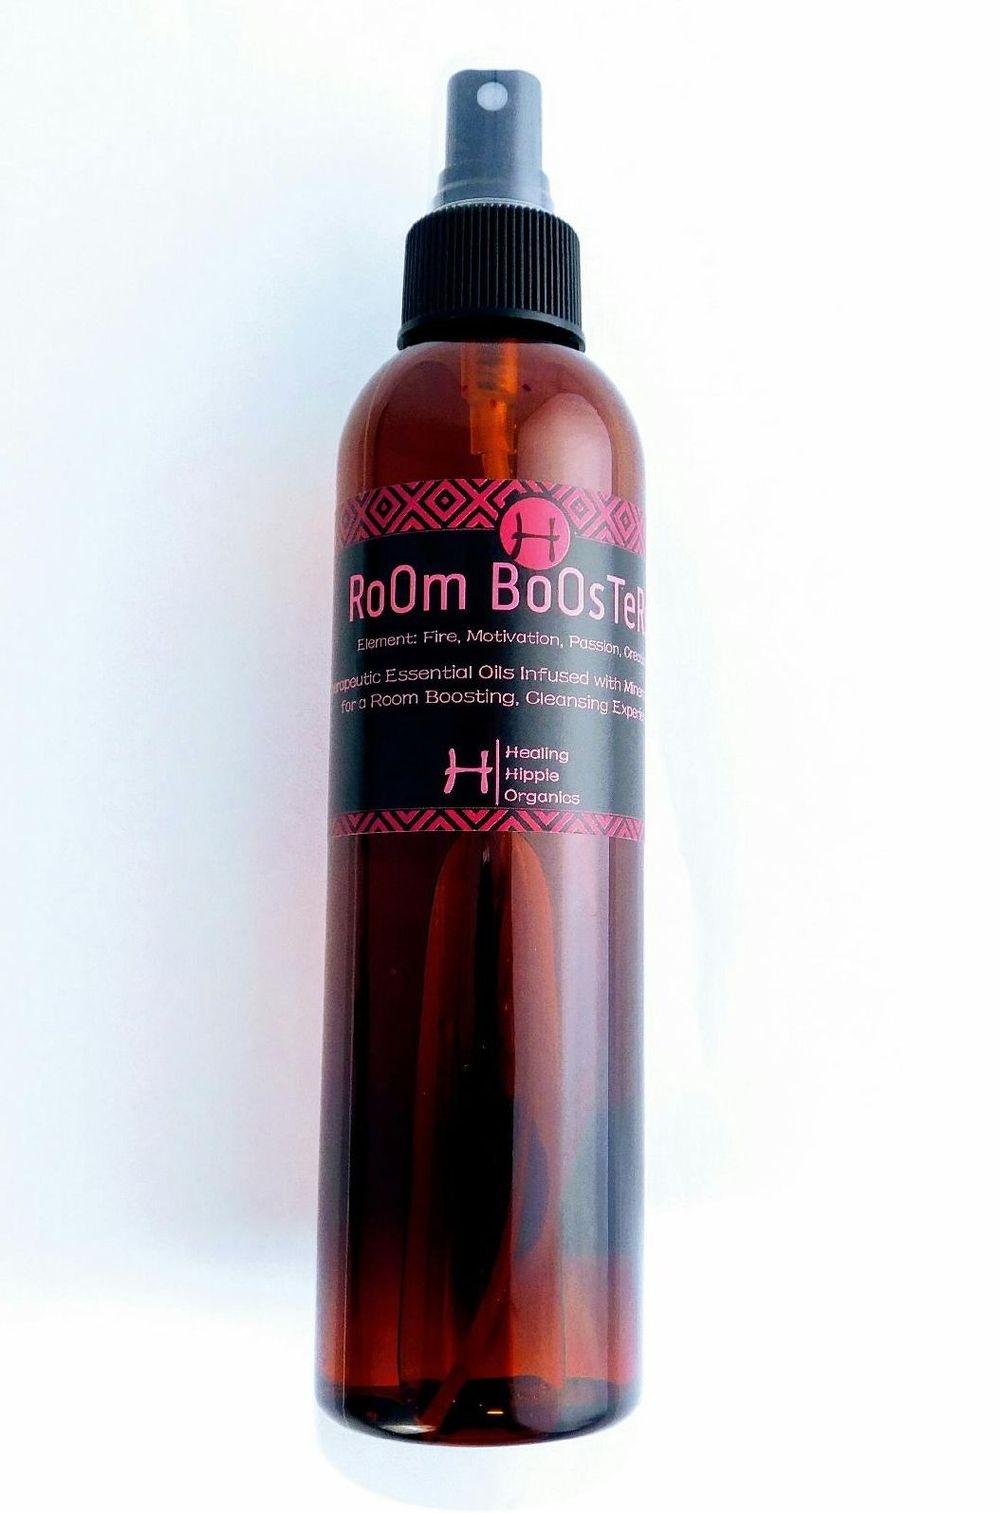 Room Booster Fire, Healing Hippie Organics, Boise, Idaho, USA